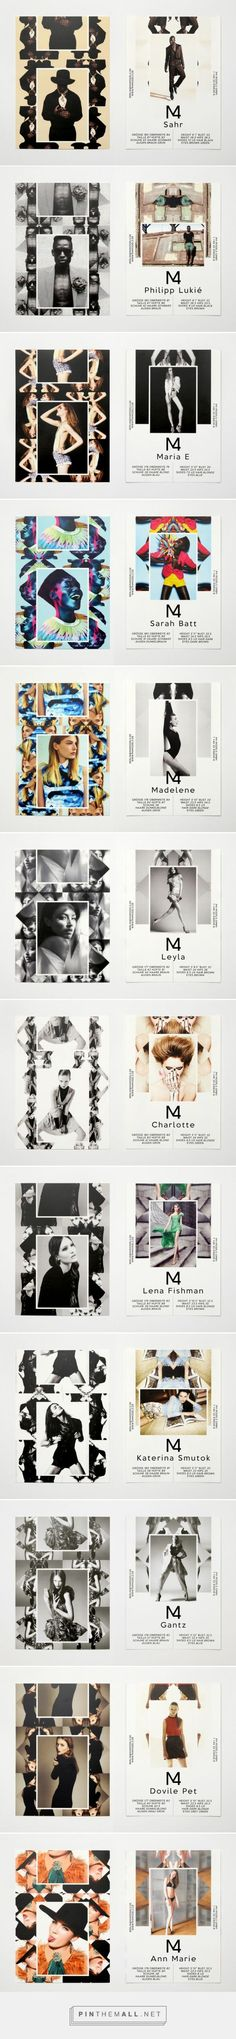 M4 Models SedCards Summer 2012 | Eps51 graphic design studio